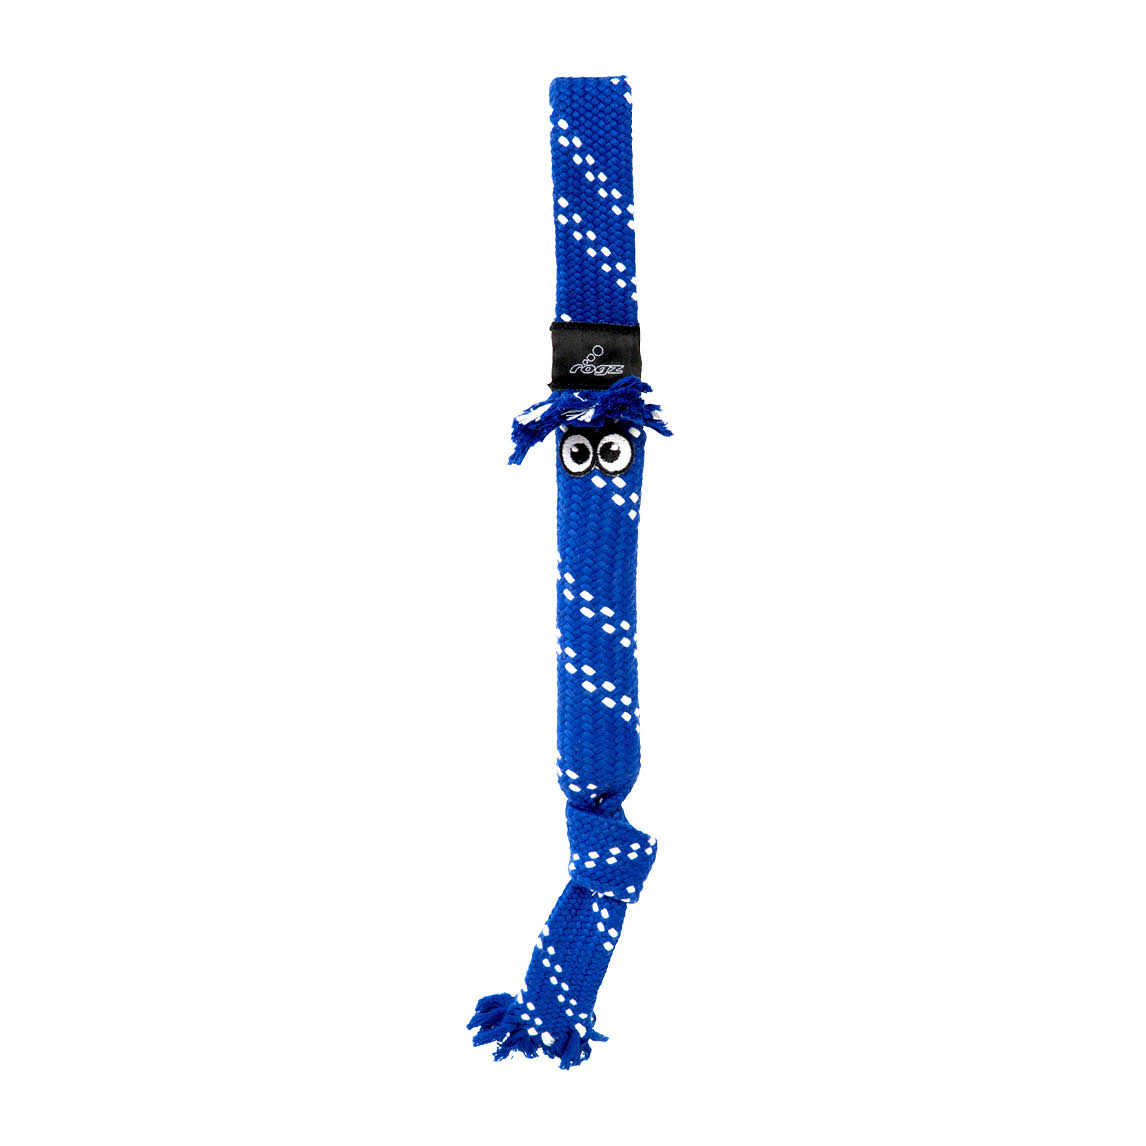 ROGZ Scrubz Small Blue 31.5cm